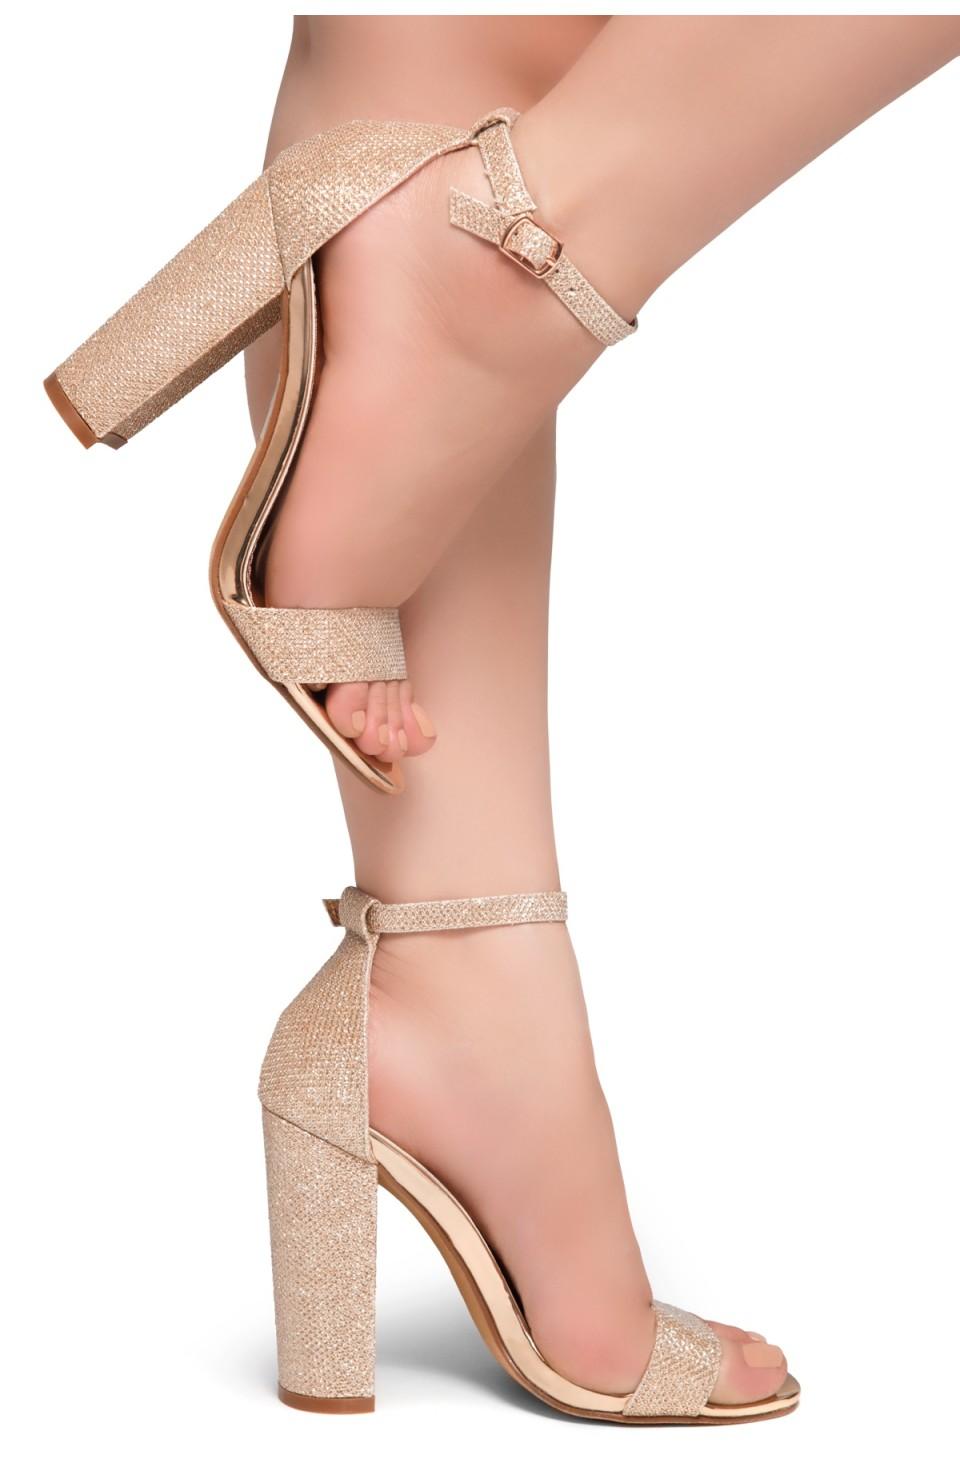 HerStyle Rosemmina Open Toe Ankle Strap Chunky Heel (RoseGold Shimmer)